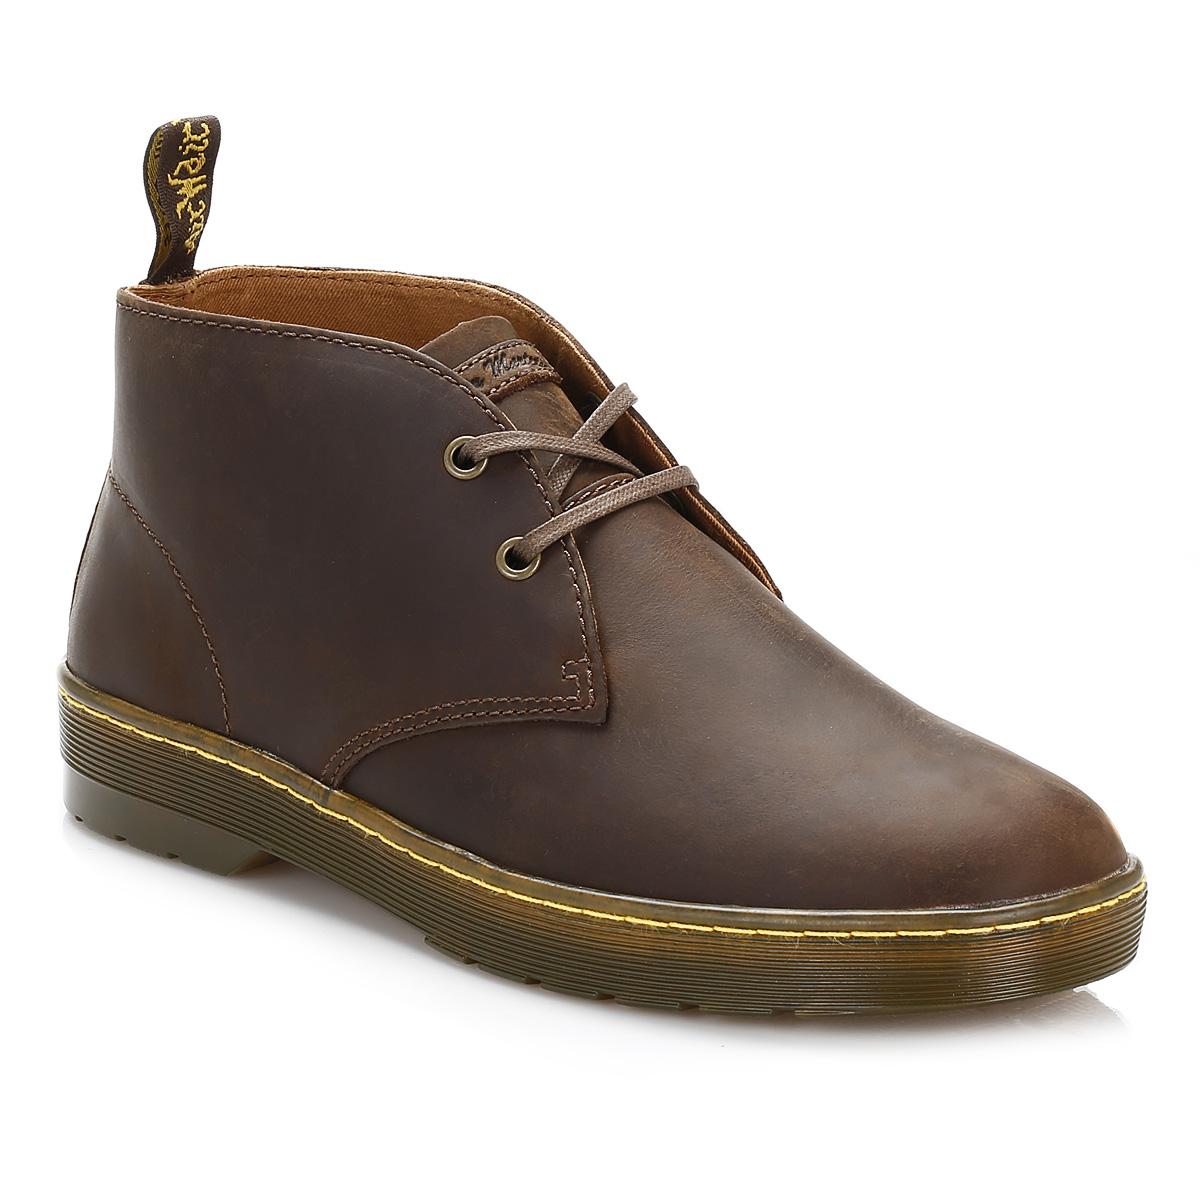 dr martens mens docs gaucho cabrillo desert boots brown